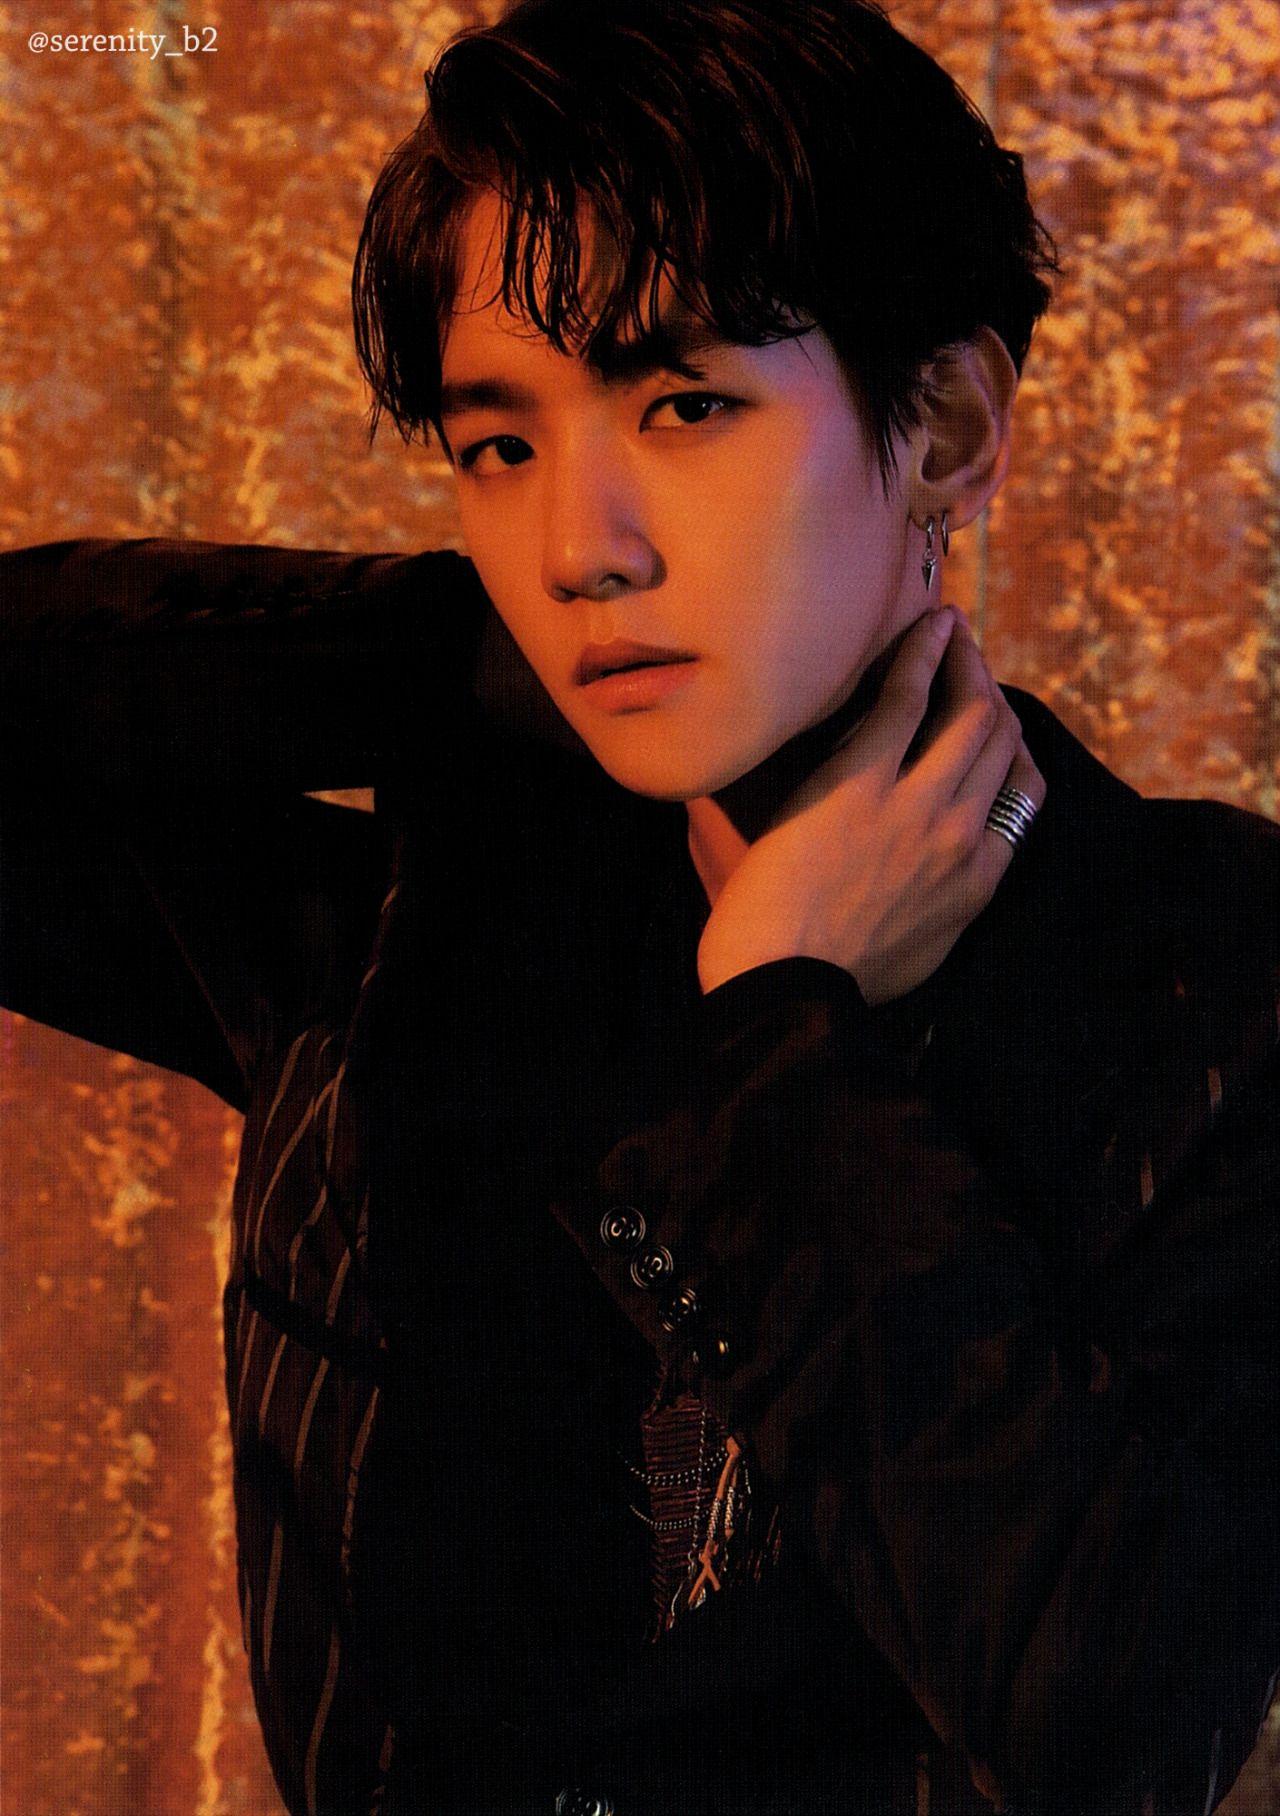 Exo Lotto Album Photoshoot 3 Baekhyun 3 Baekhyun Exo Baekhyun Baekhyun Hot